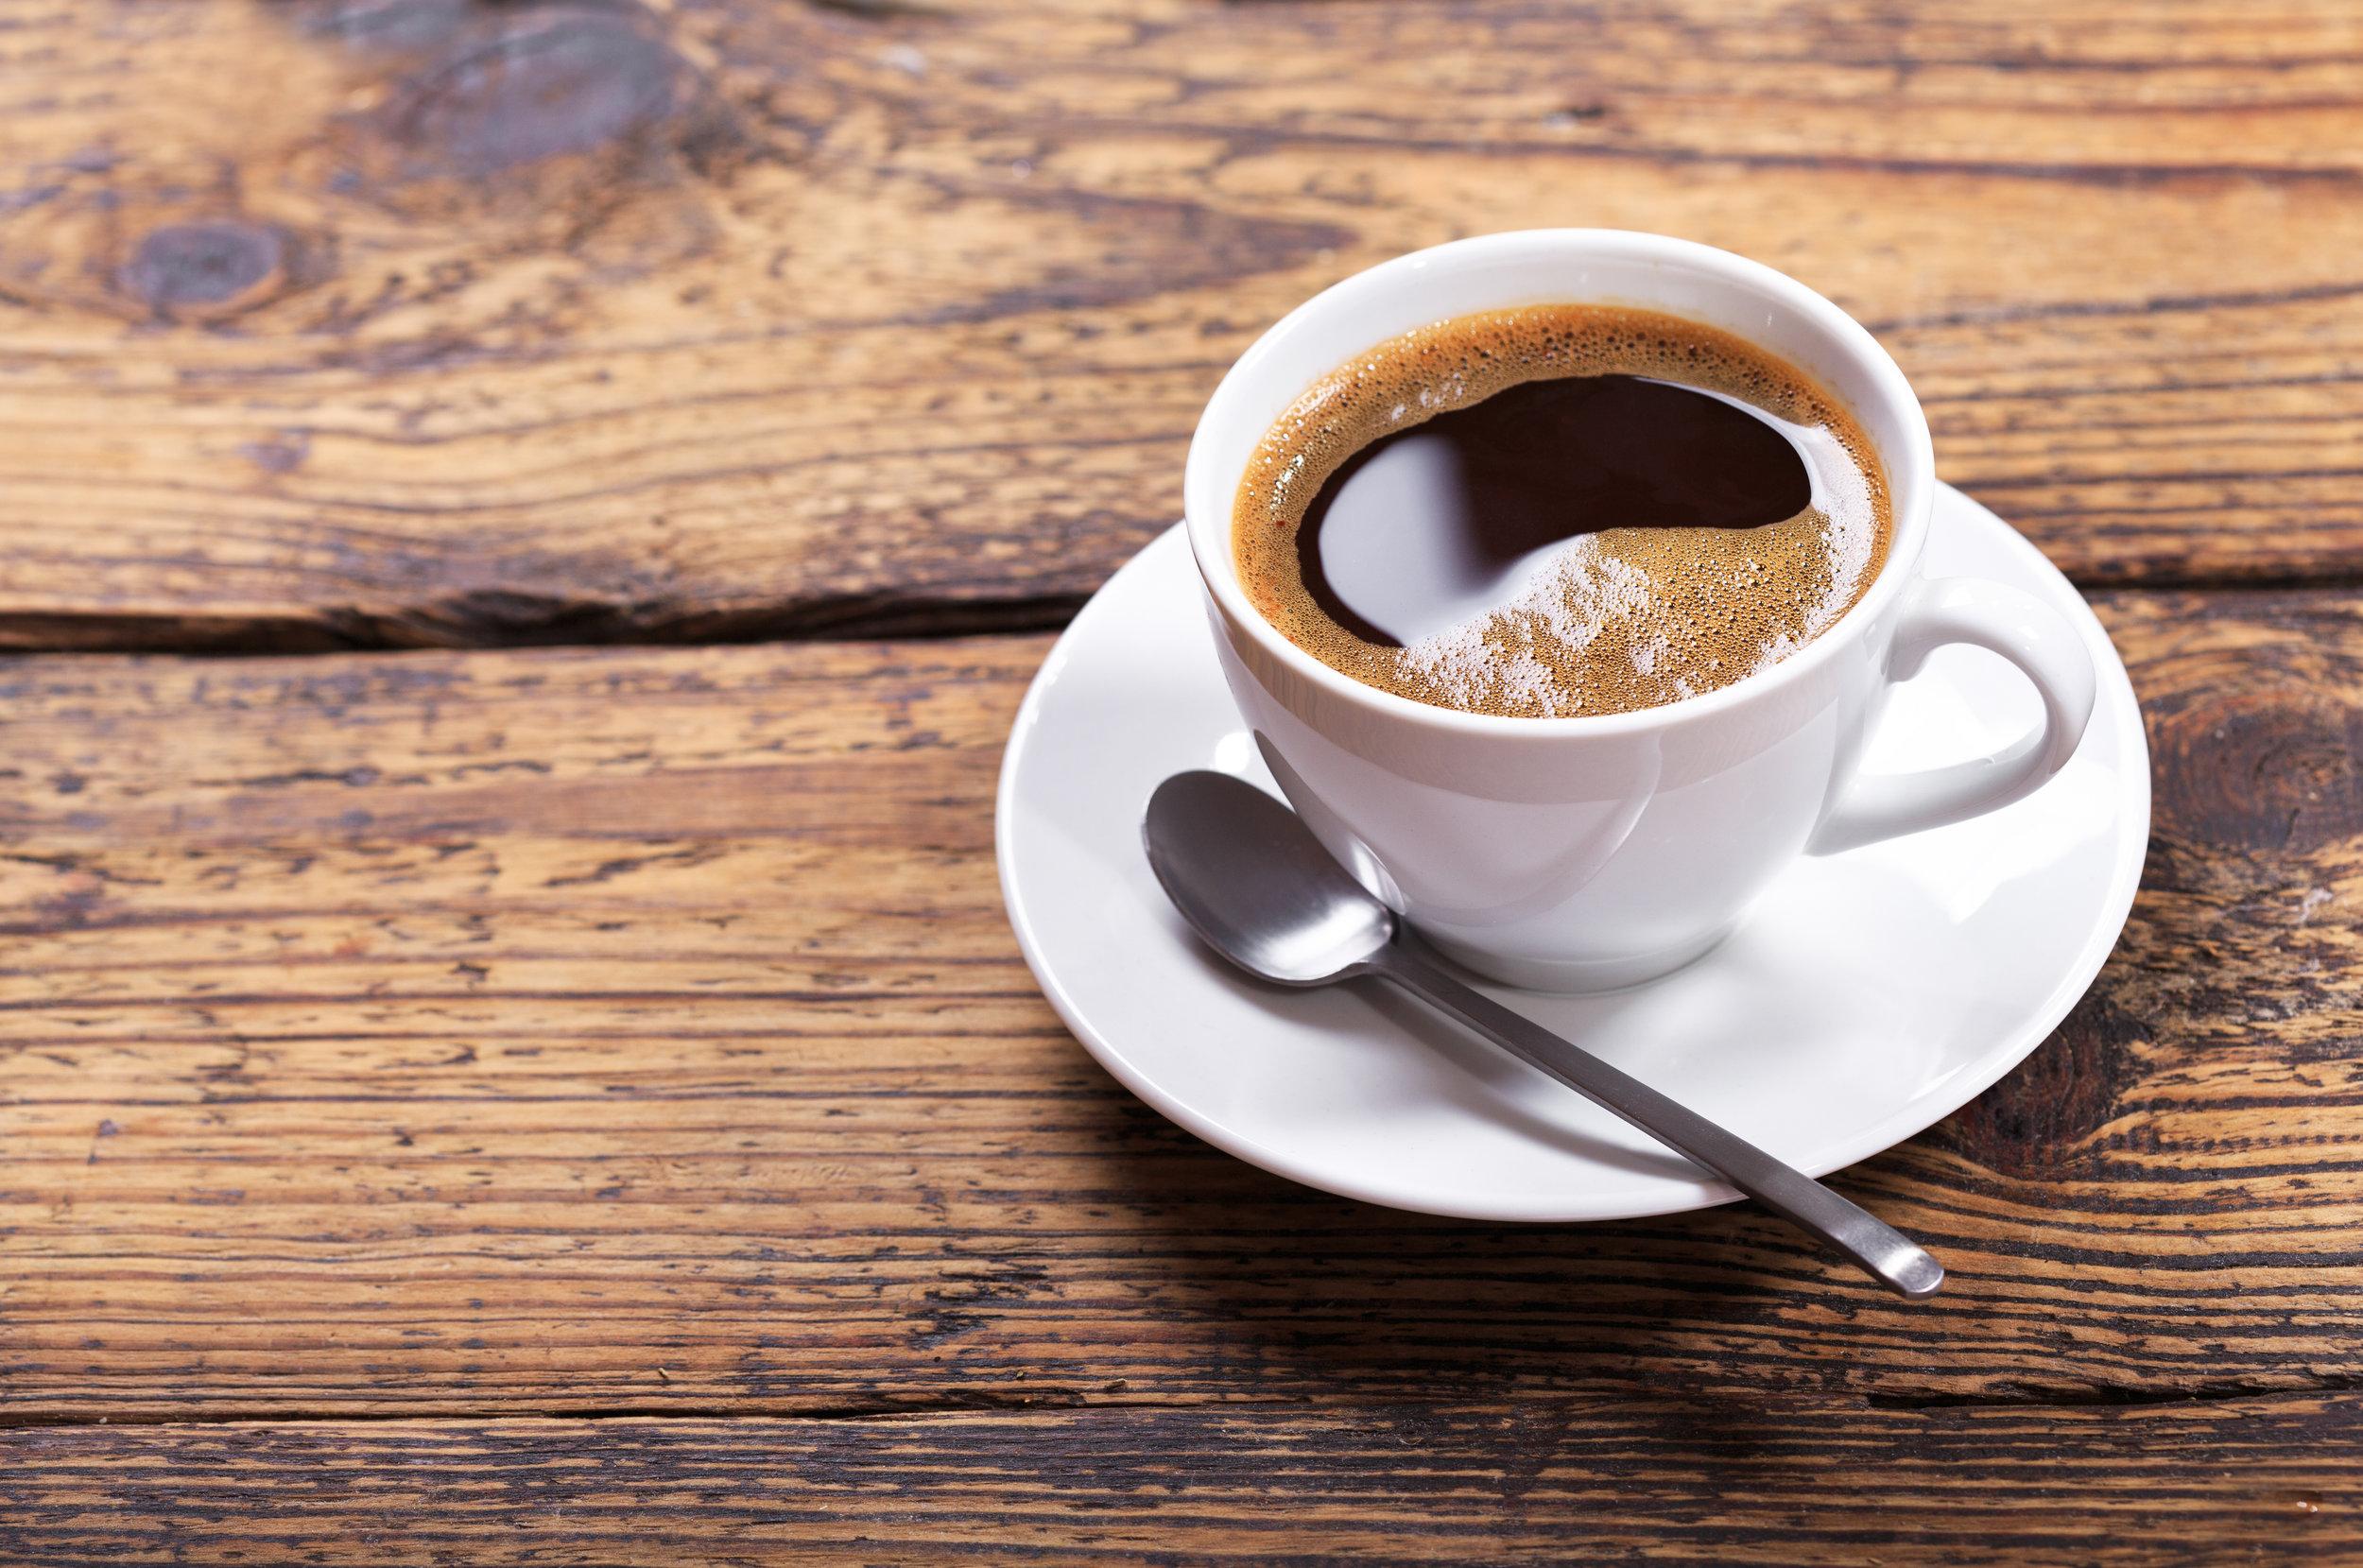 CoffeeKidneys